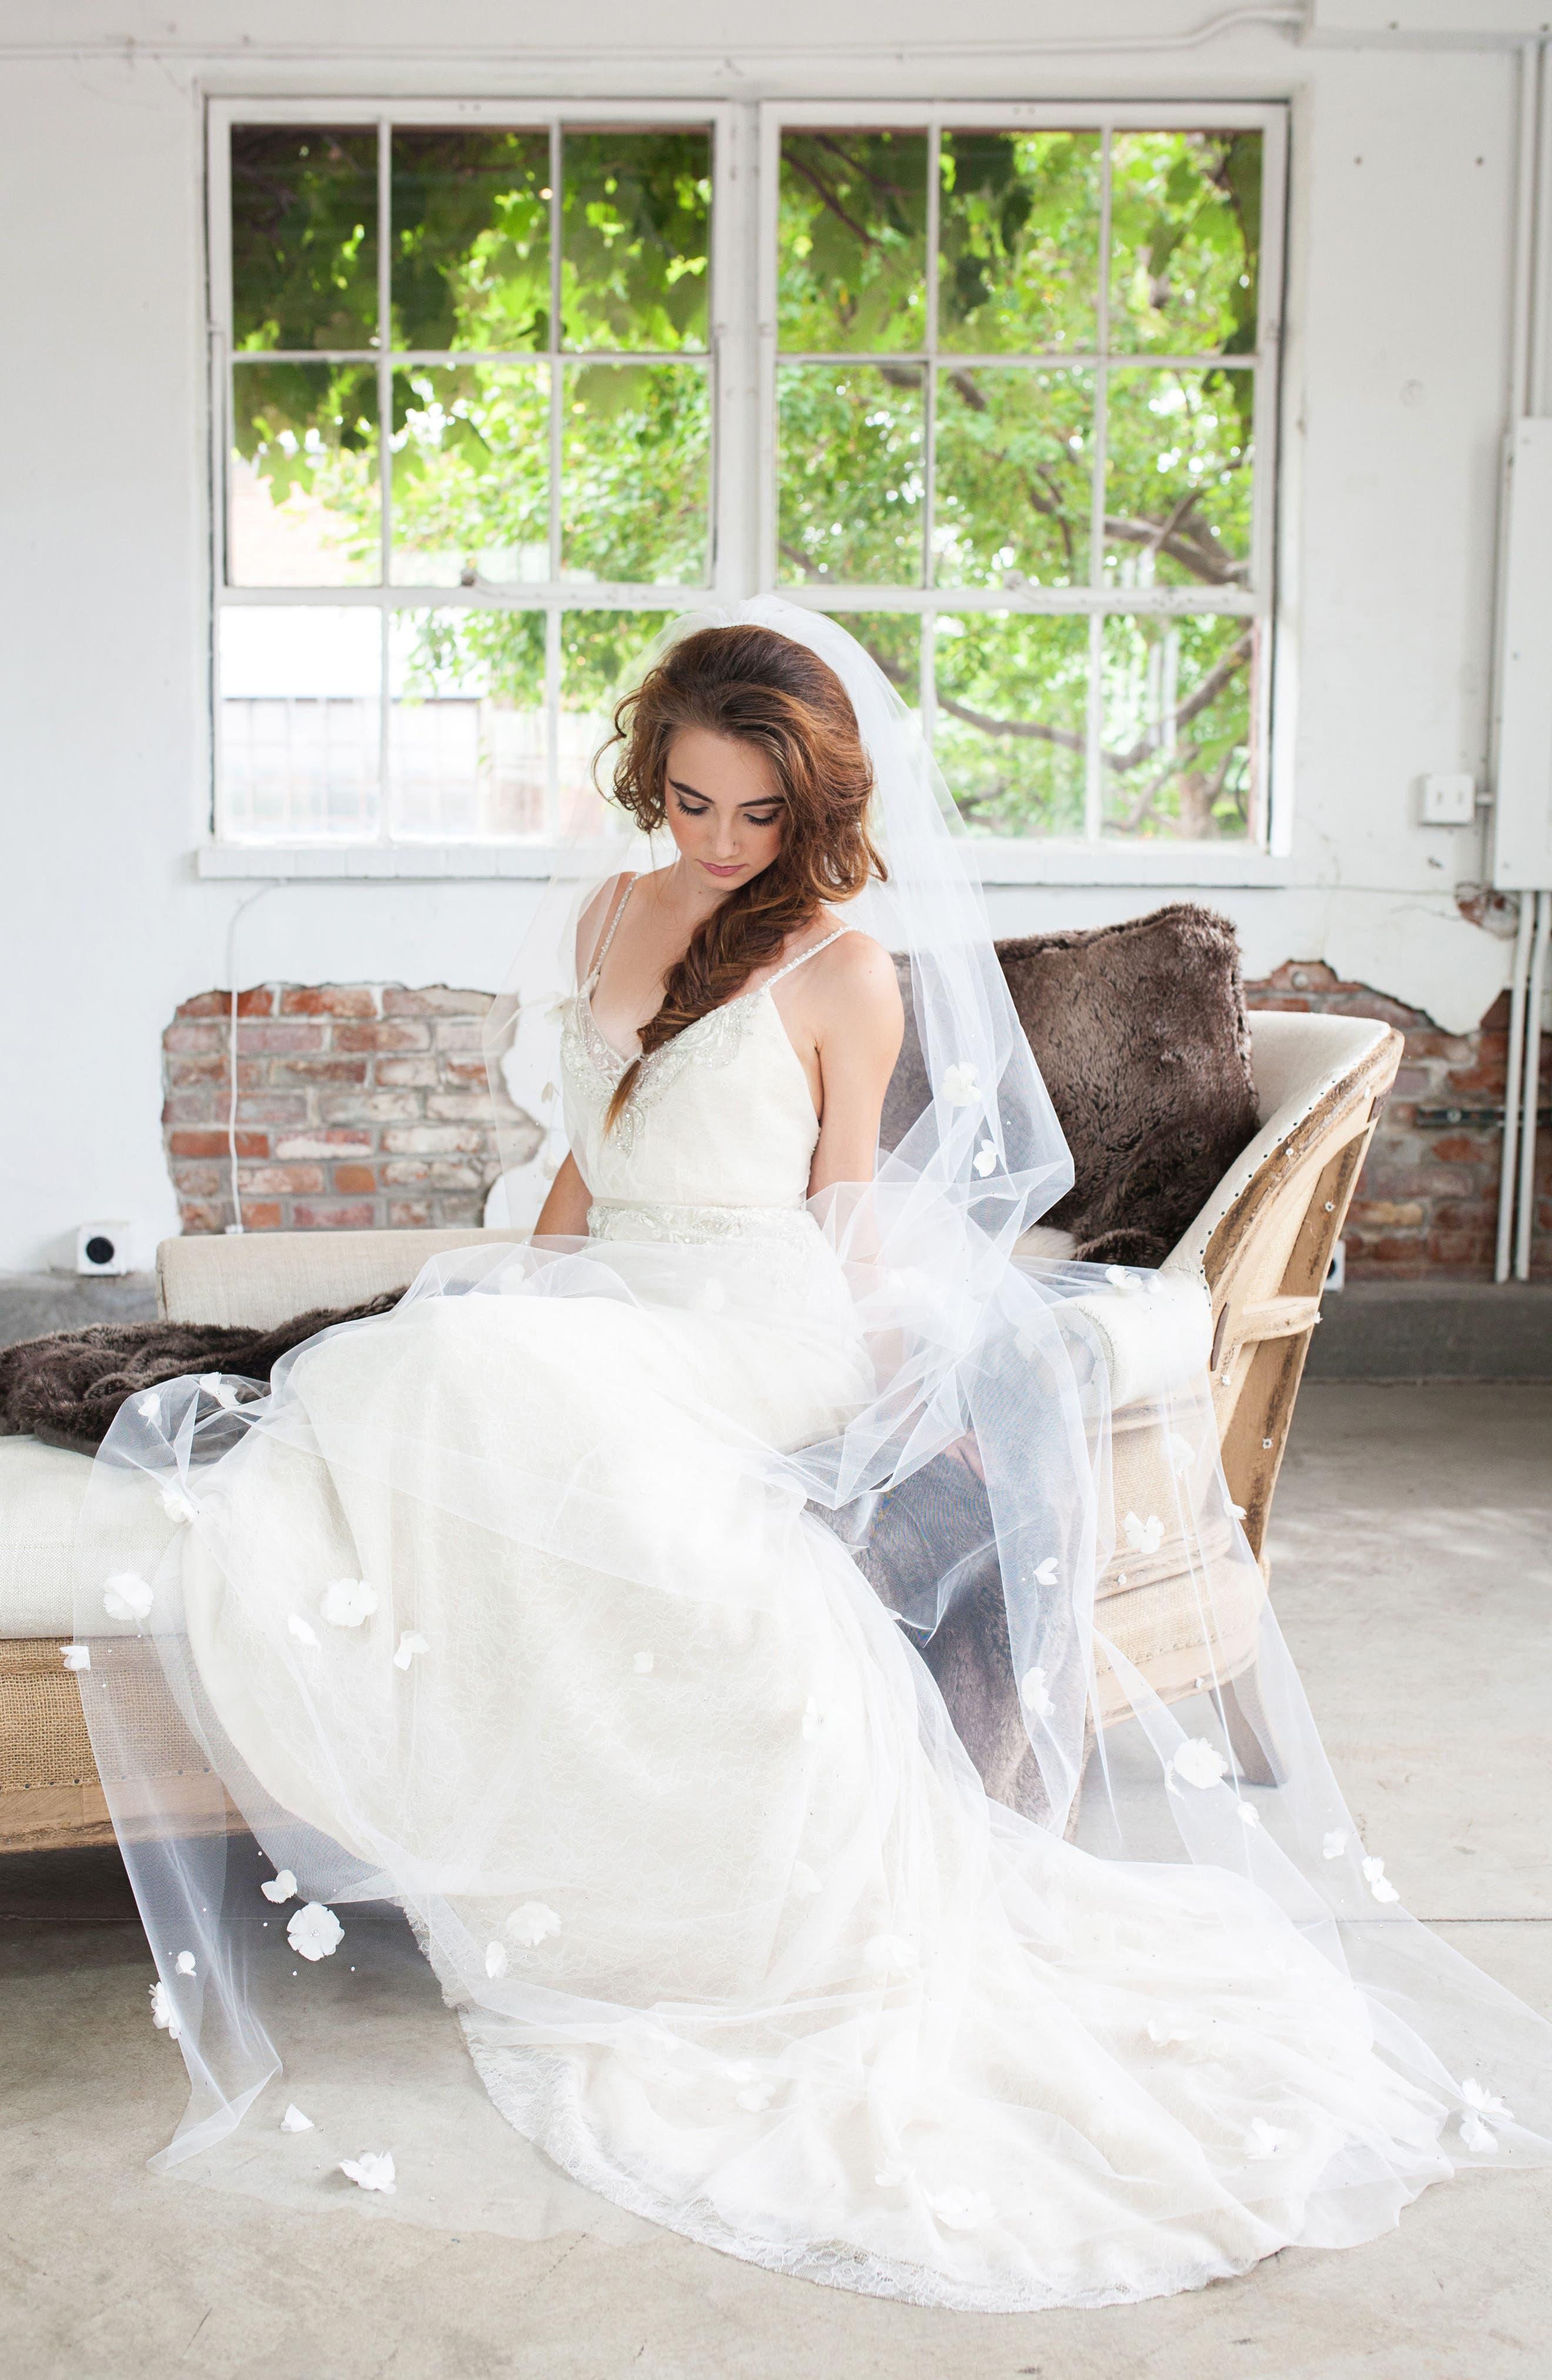 Fleet Embellished Bridal Veil,                             Alternate thumbnail 4, color,                             LIGHT IVORY